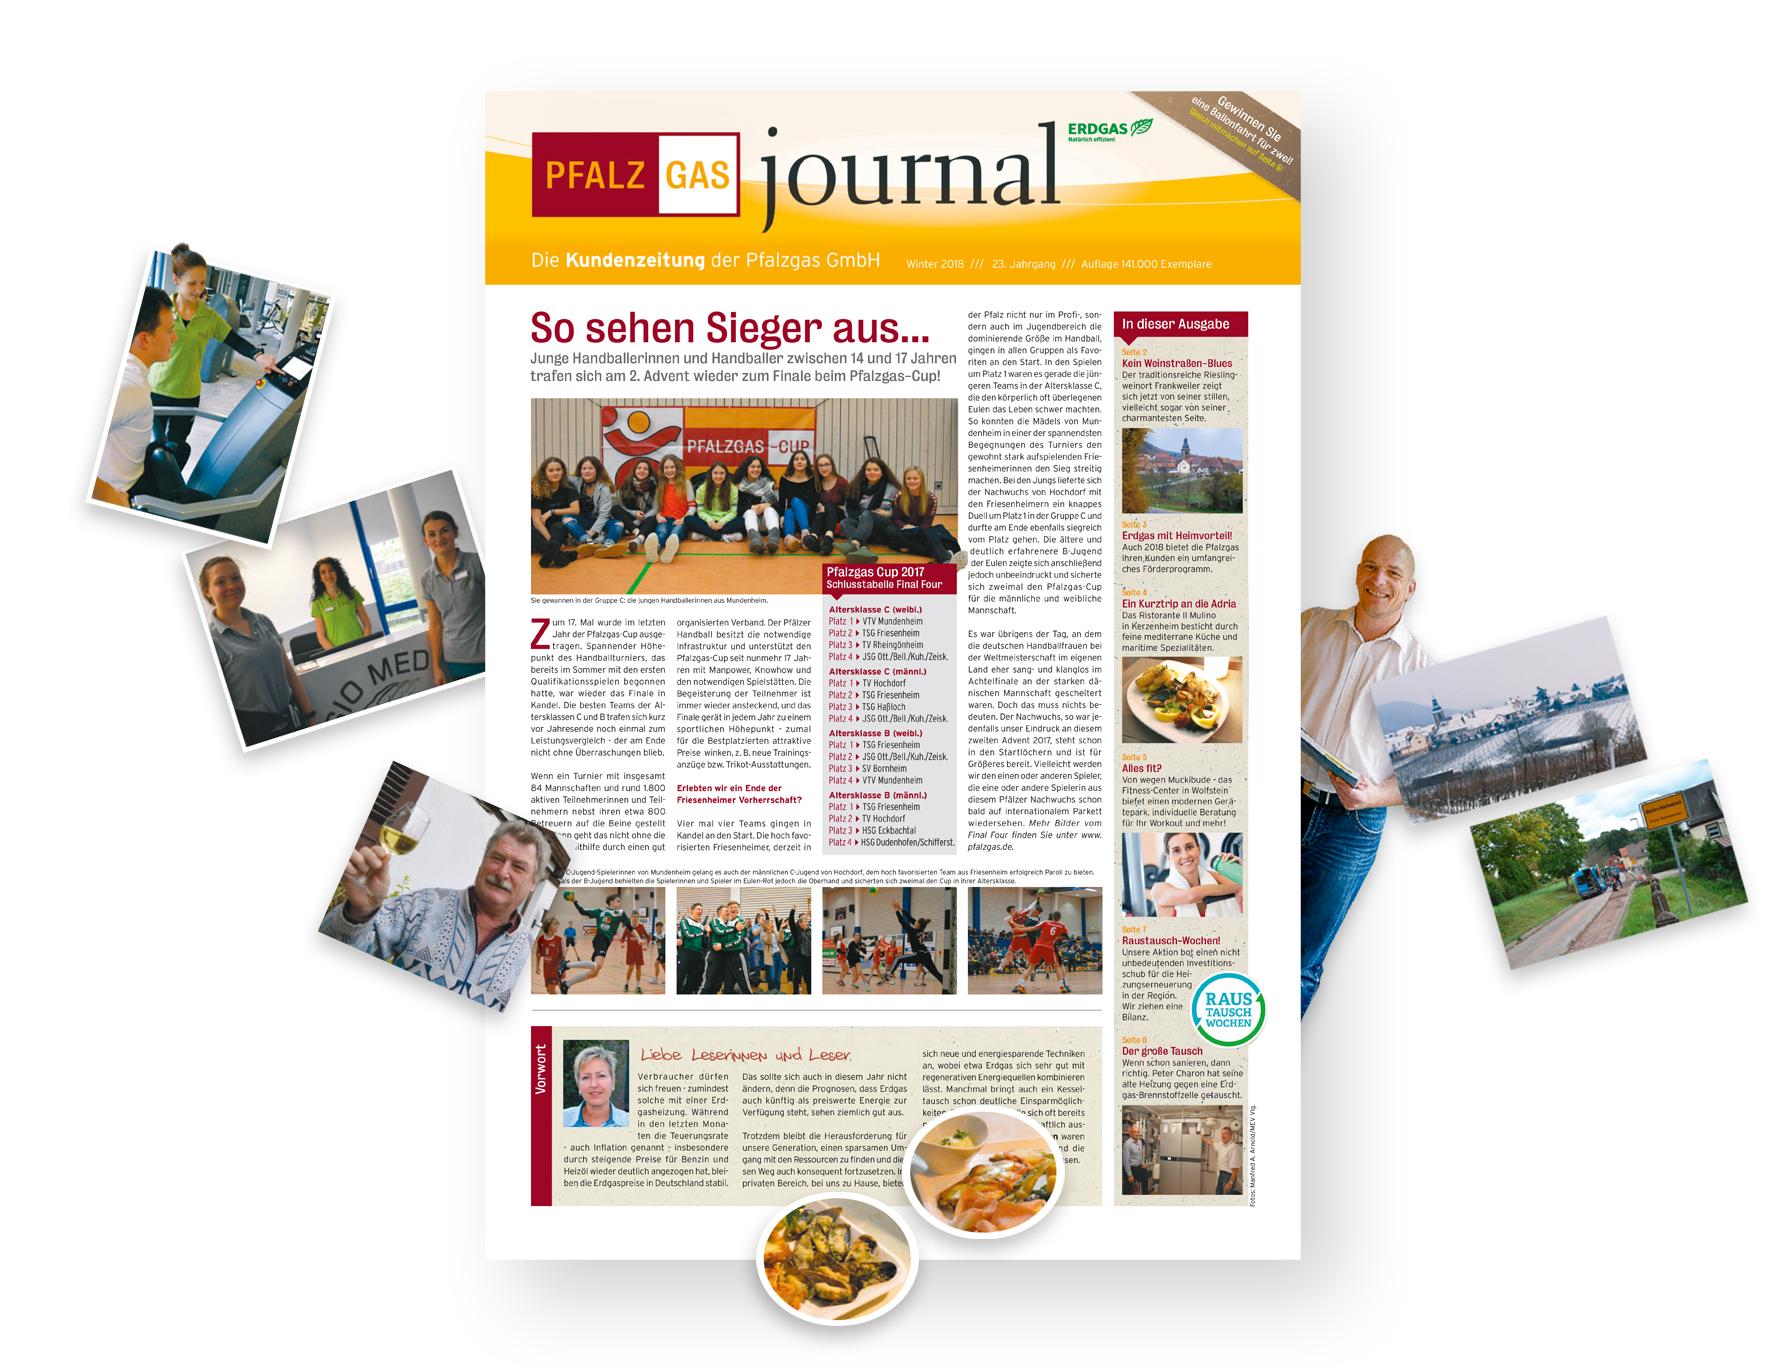 Pfalzgas Journal